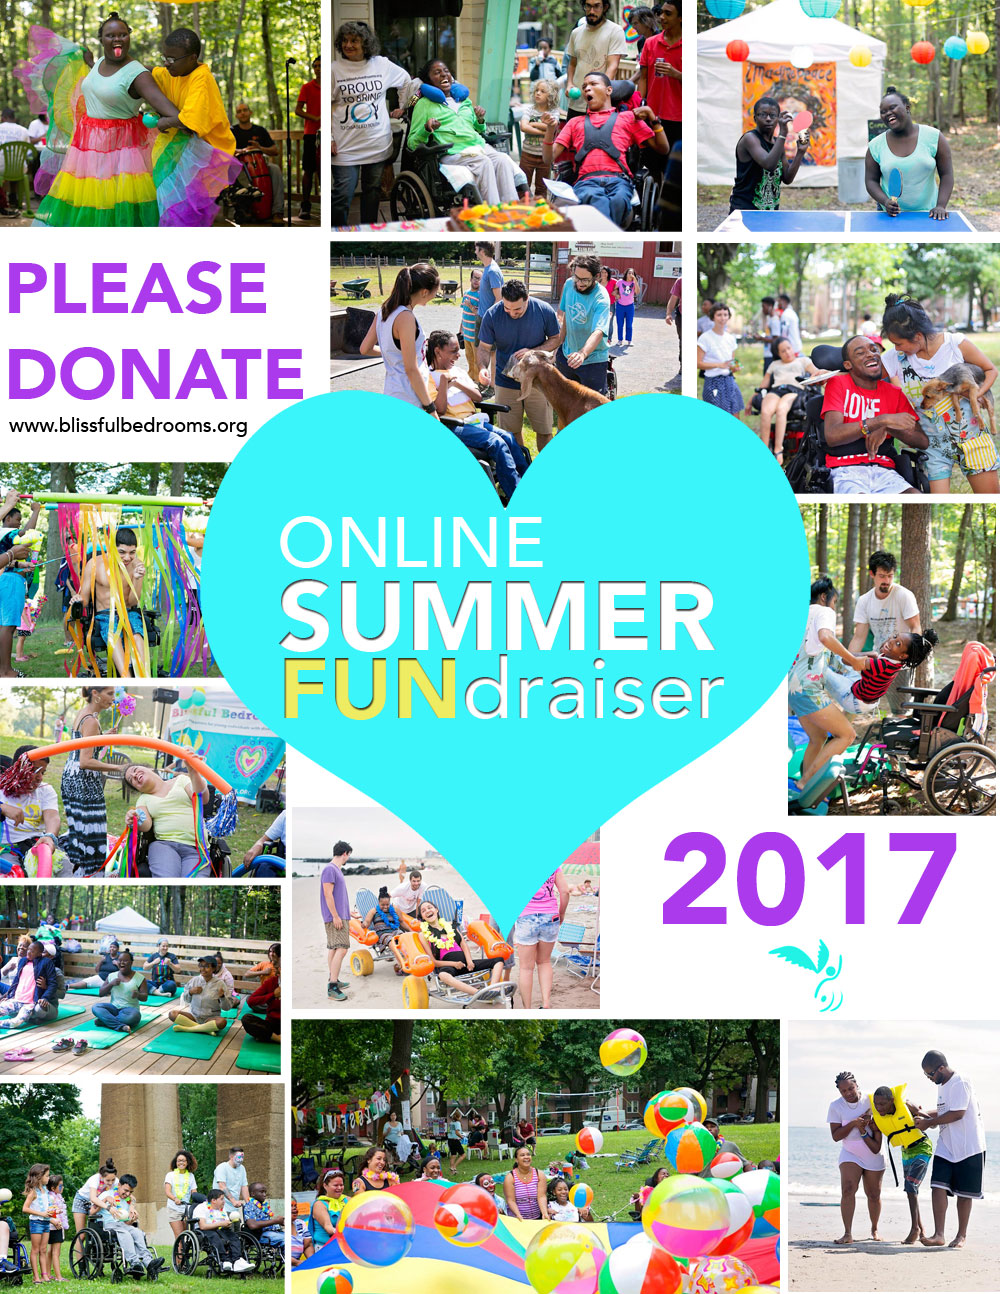 Summer-online-fundraiser-2017